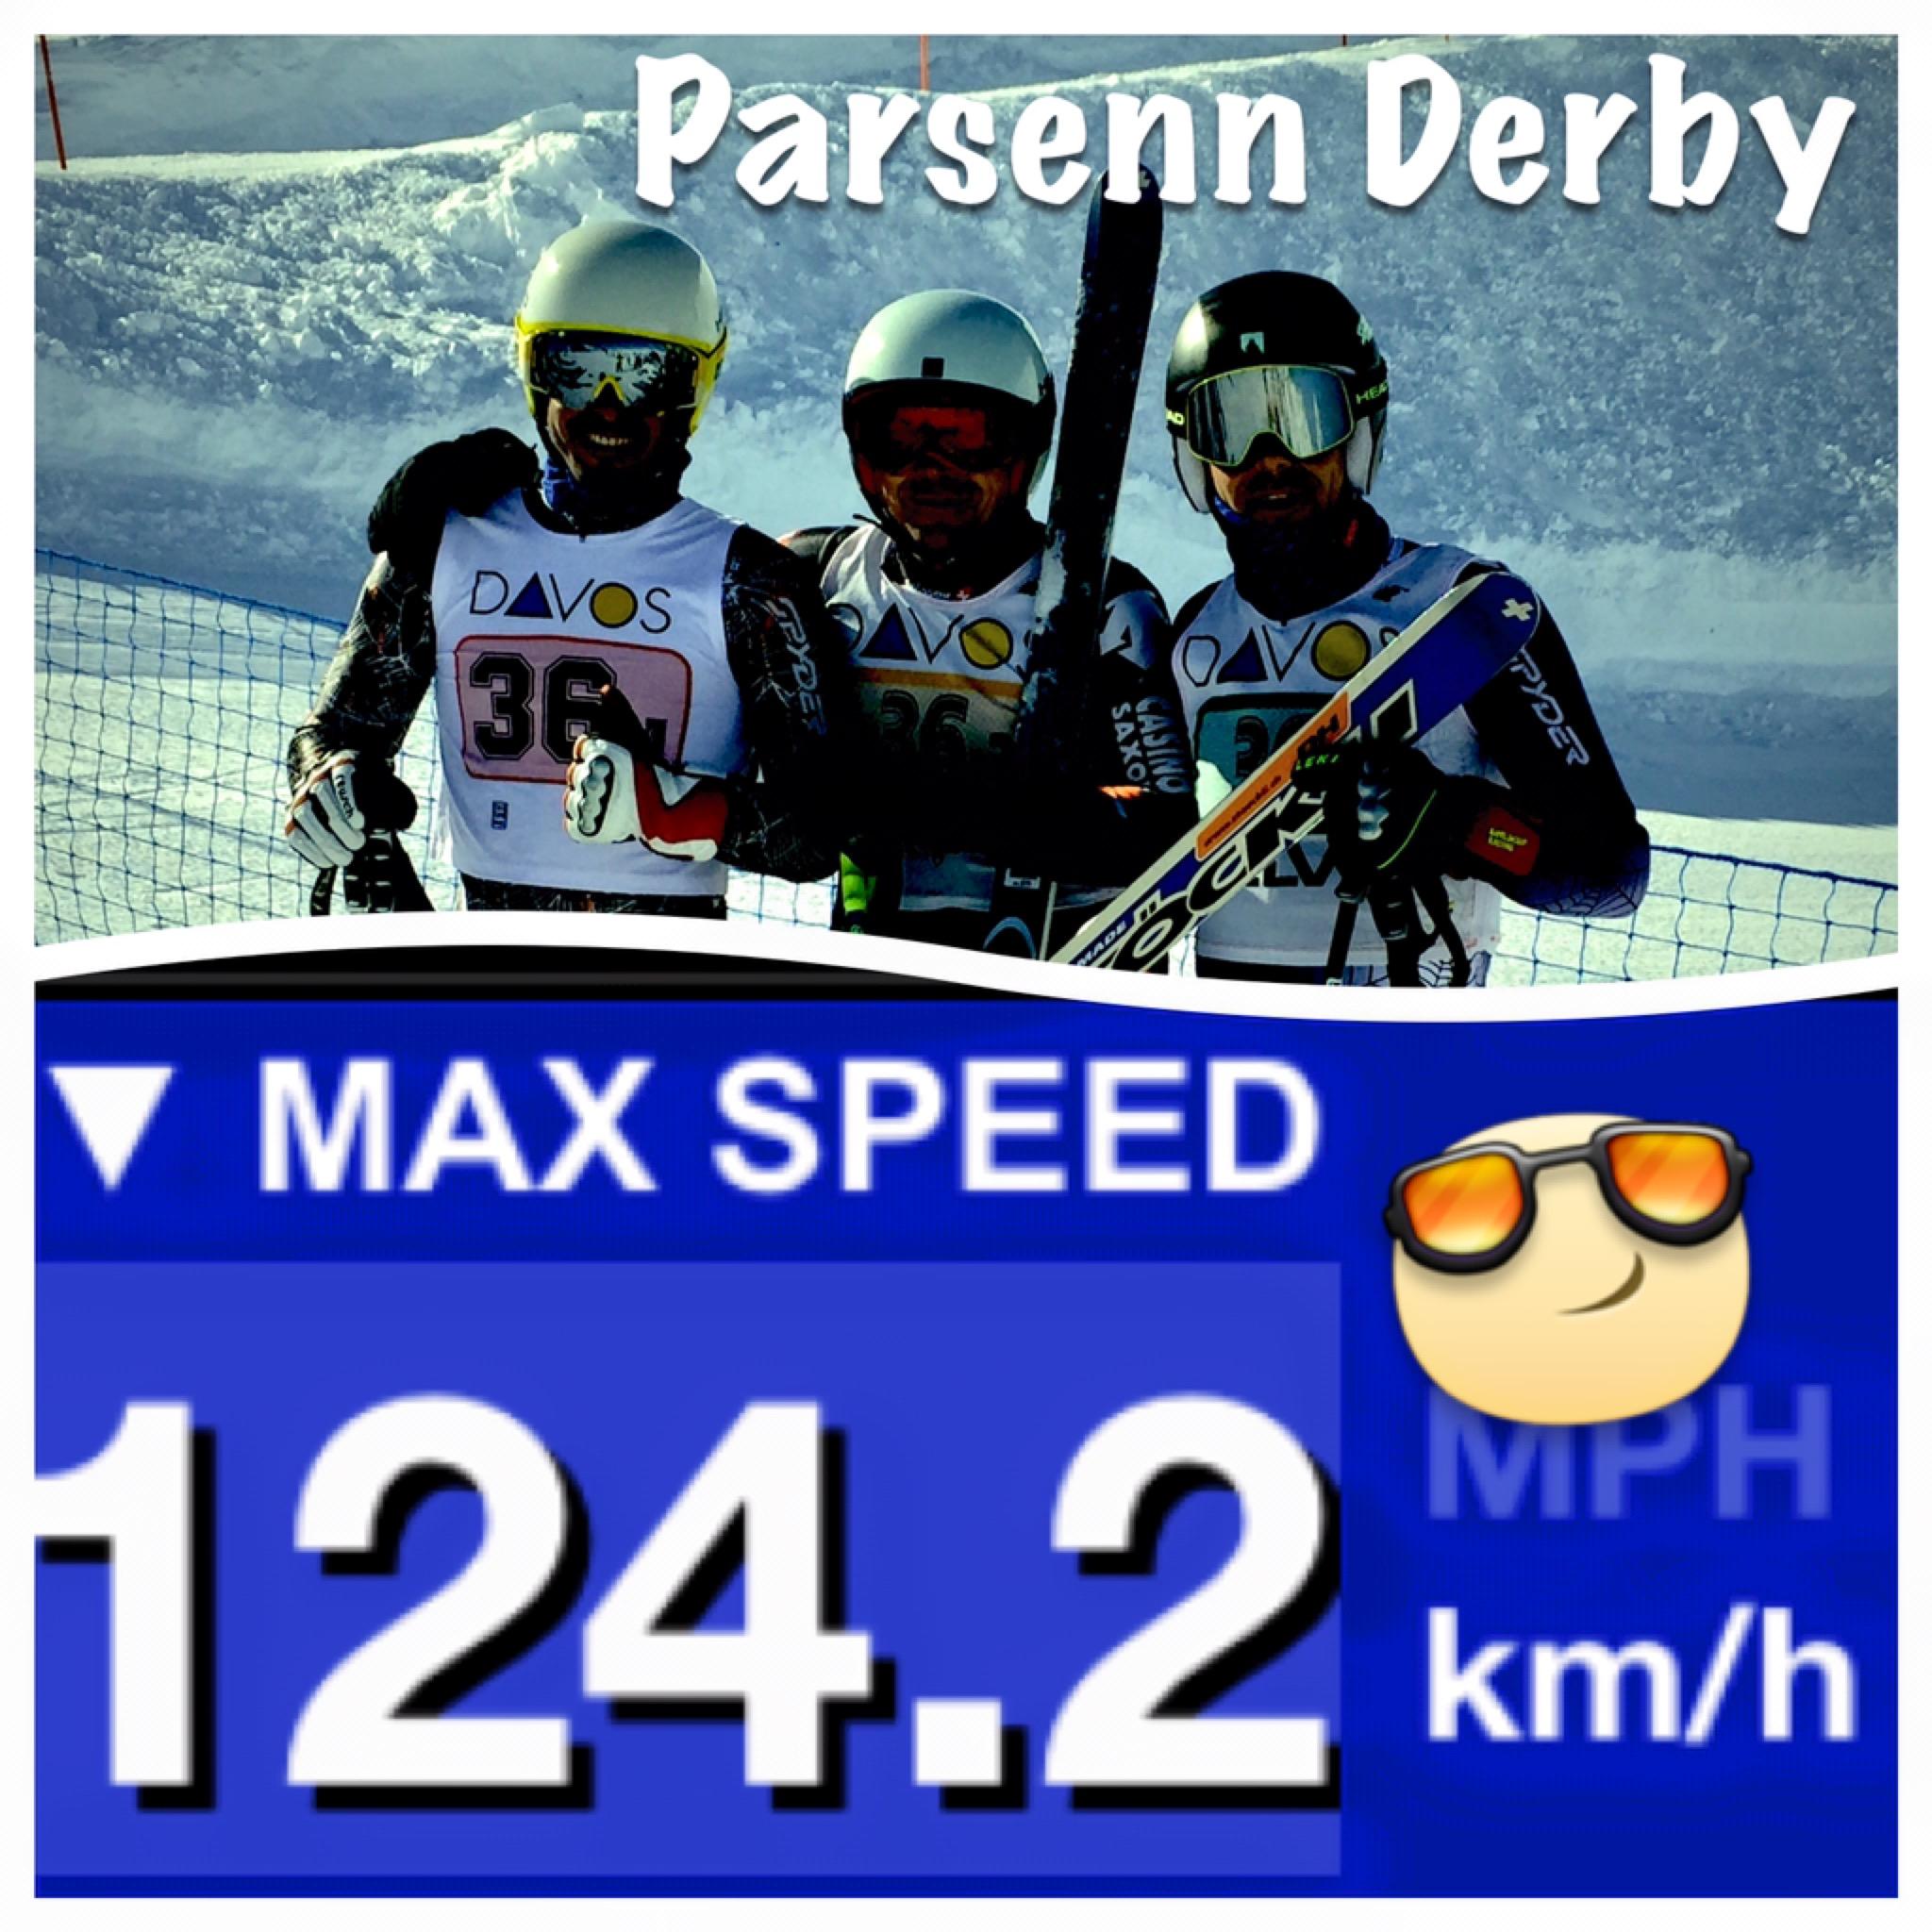 2015 Parsenn Derby, Davos (SUI)